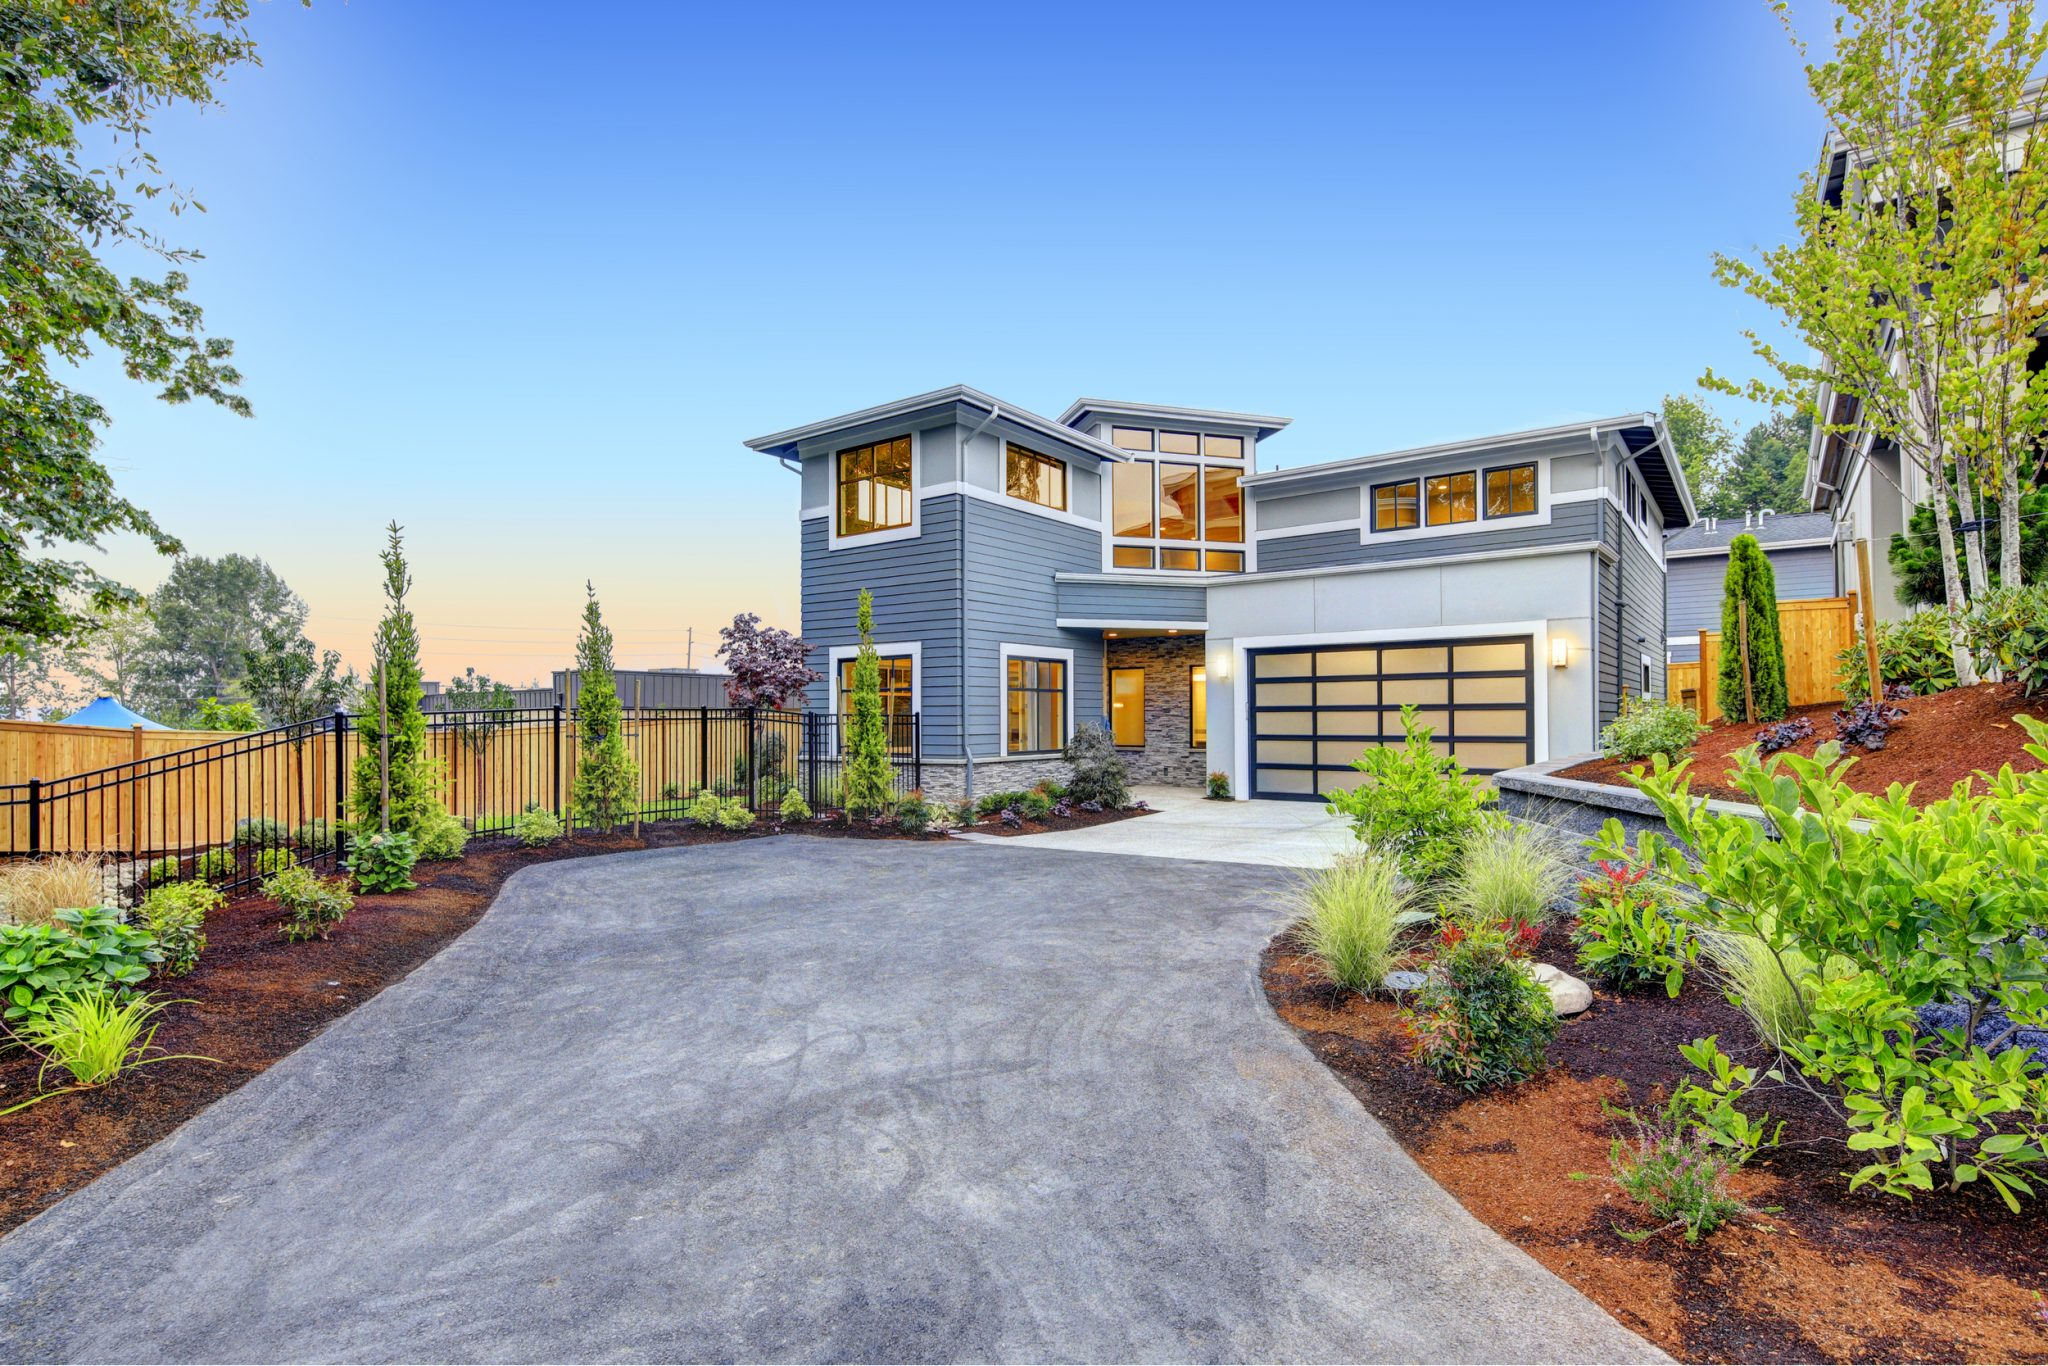 Driveway Designs for Modern Home Asphalt